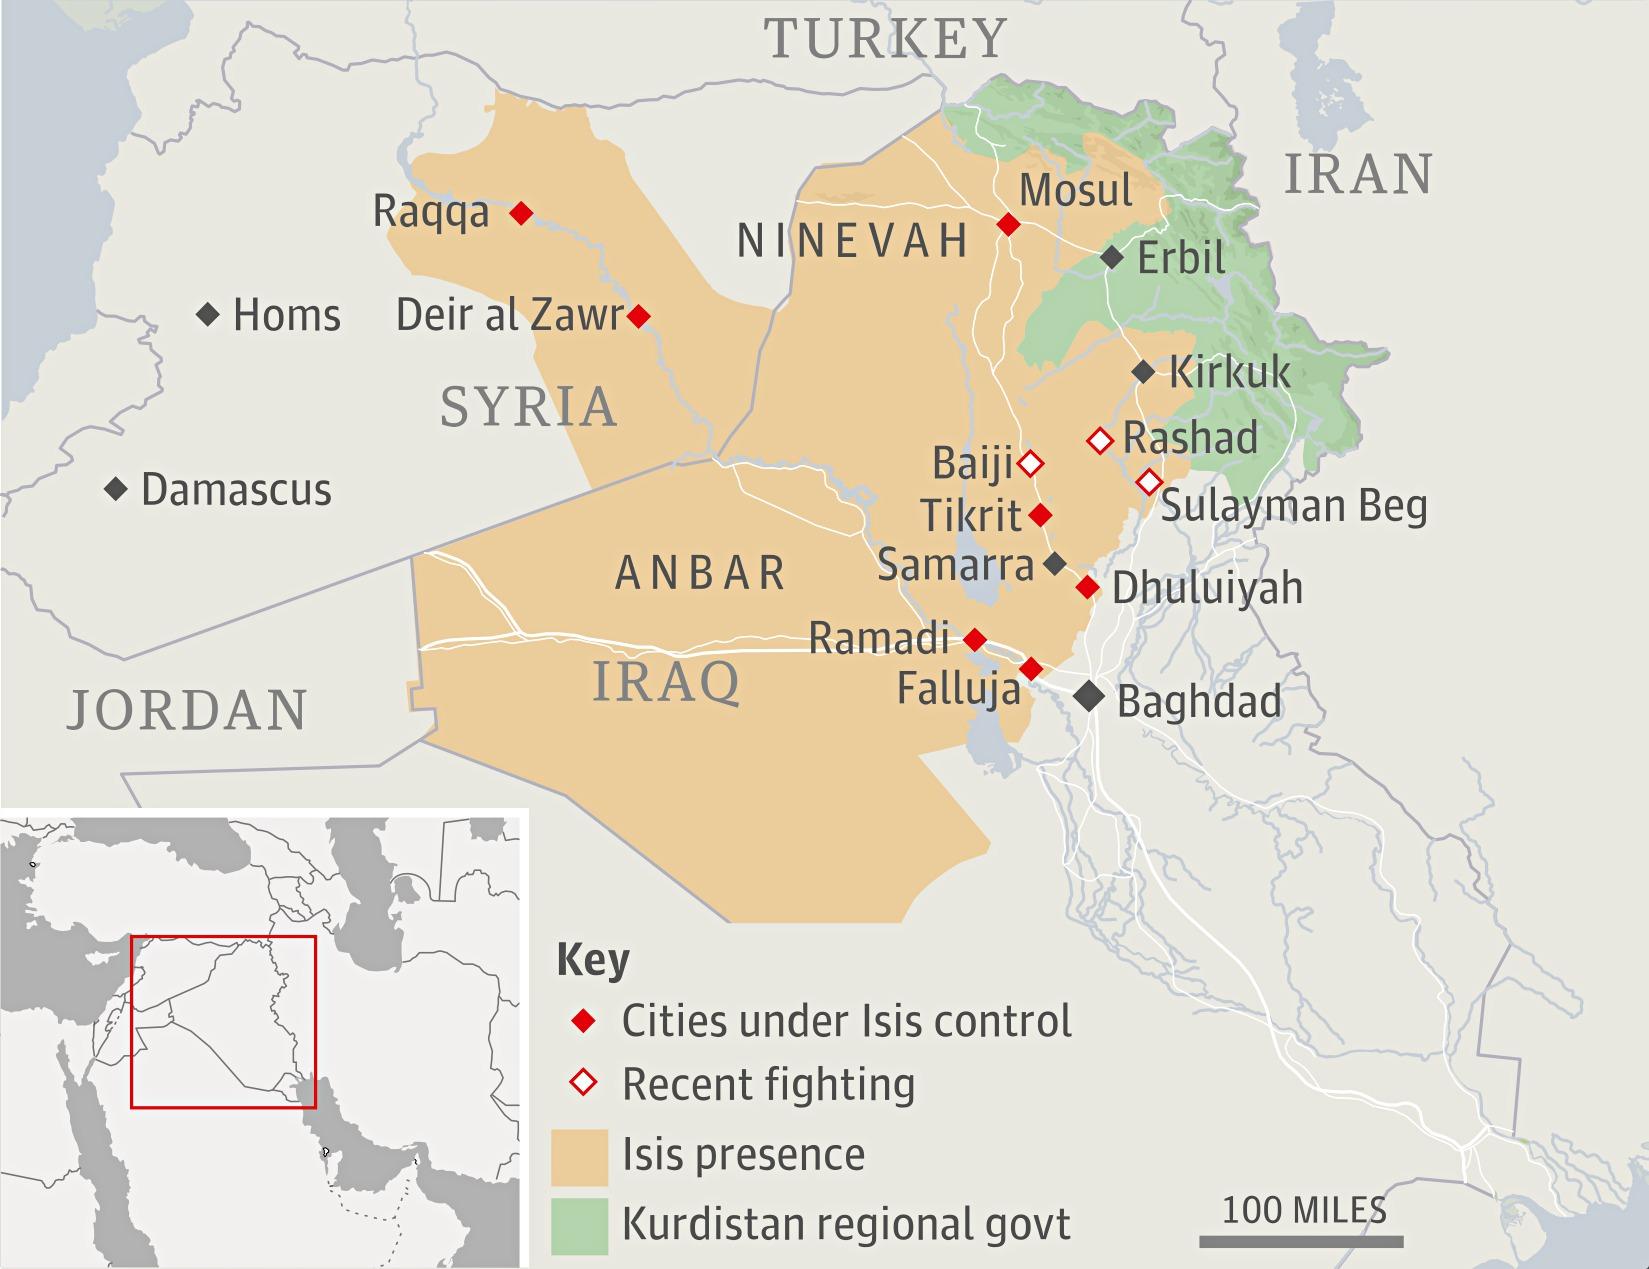 Iraqi Kurdish forces take Kirkuk as Isis sets its sights on Baghdad on israel world map, turkey world map, nyc world map, scotland world map, balkans world map, lebanon world map, serbia world map, golan heights world map, mali world map, germany world map, rwanda world map, gaza on world map, south ossetia world map, palestine world map, george world map, kobani world map, taiwan world map, iceland world map, kazakhstan world map, chad world map,